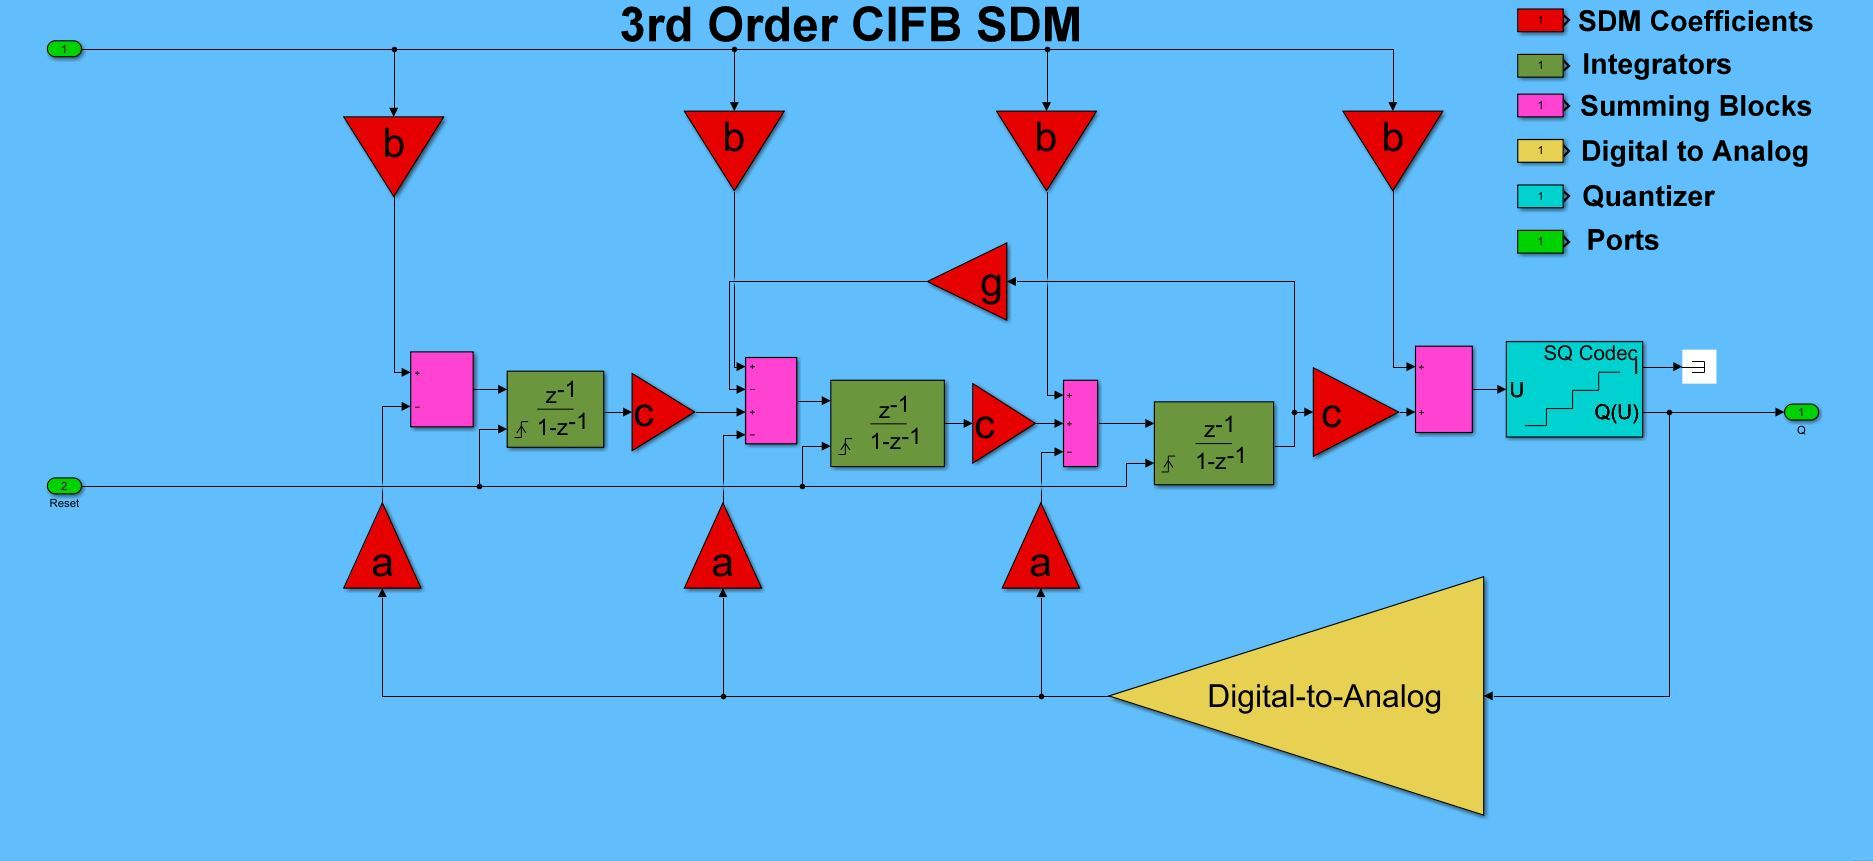 SDM Data Converter Architecture Considerations for Custom IC Designs